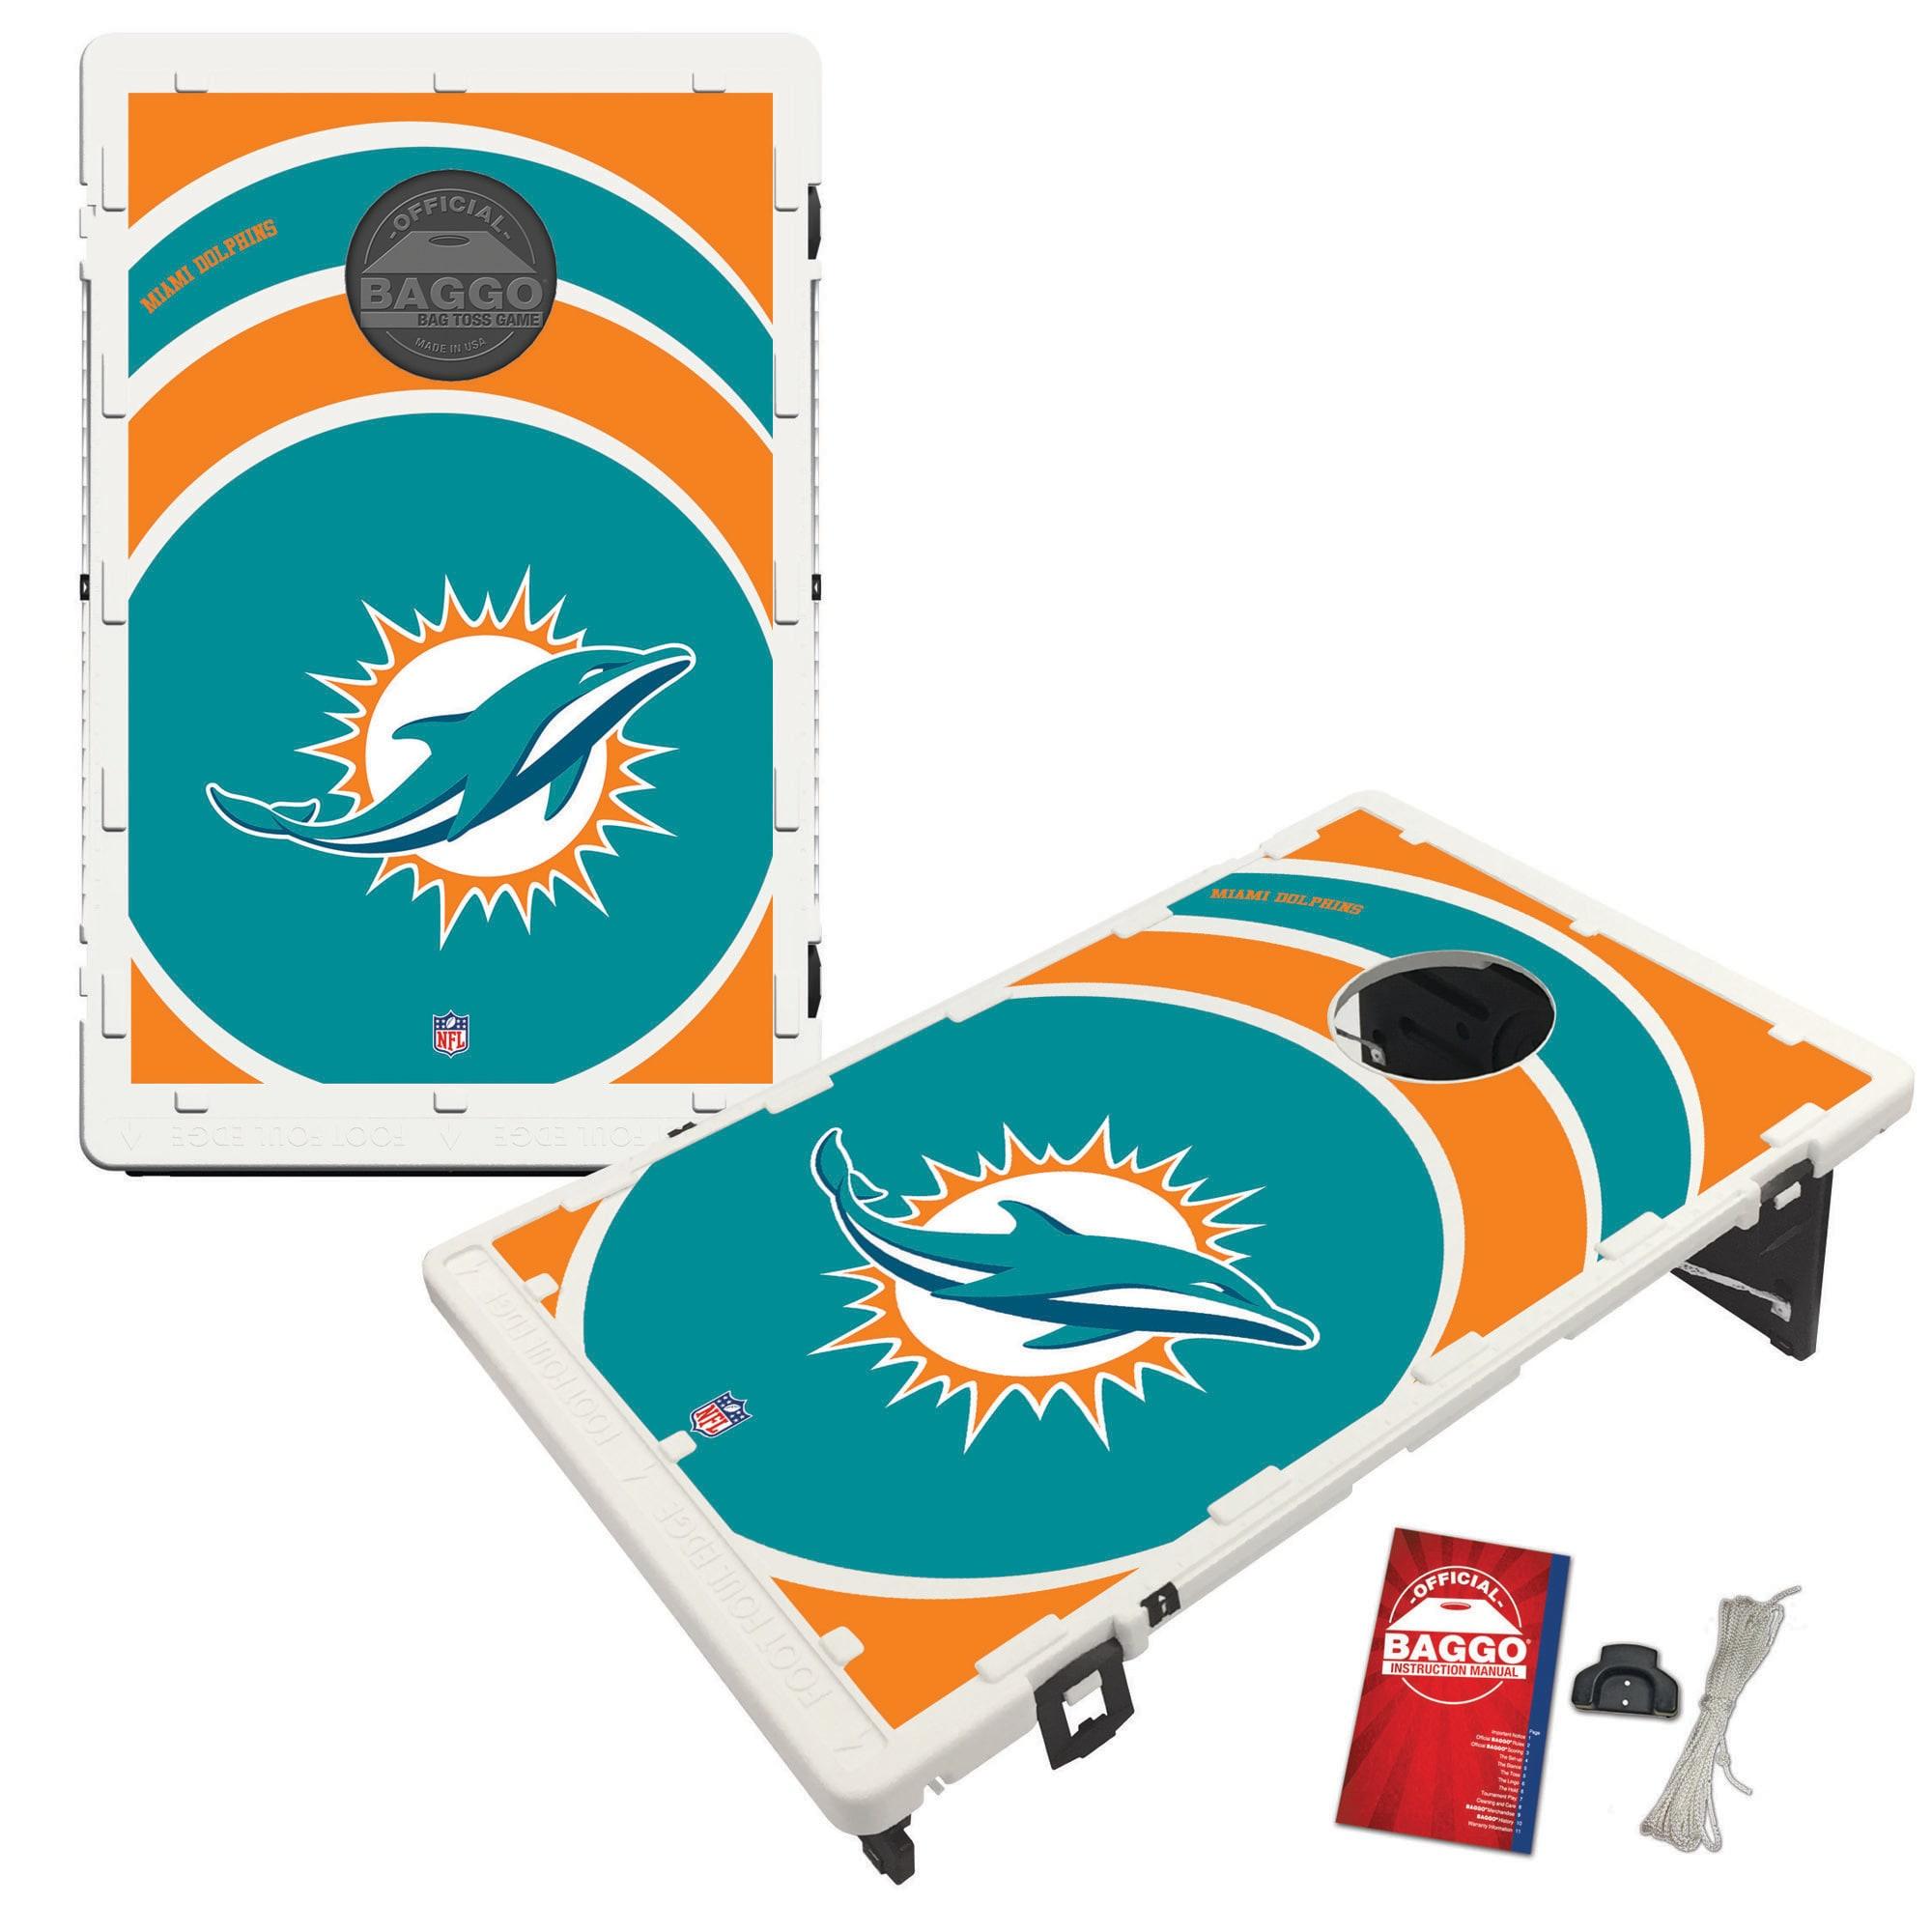 Miami Dolphins 2' x 3' BAGGO Vortex Cornhole Board Tailgate Toss Set